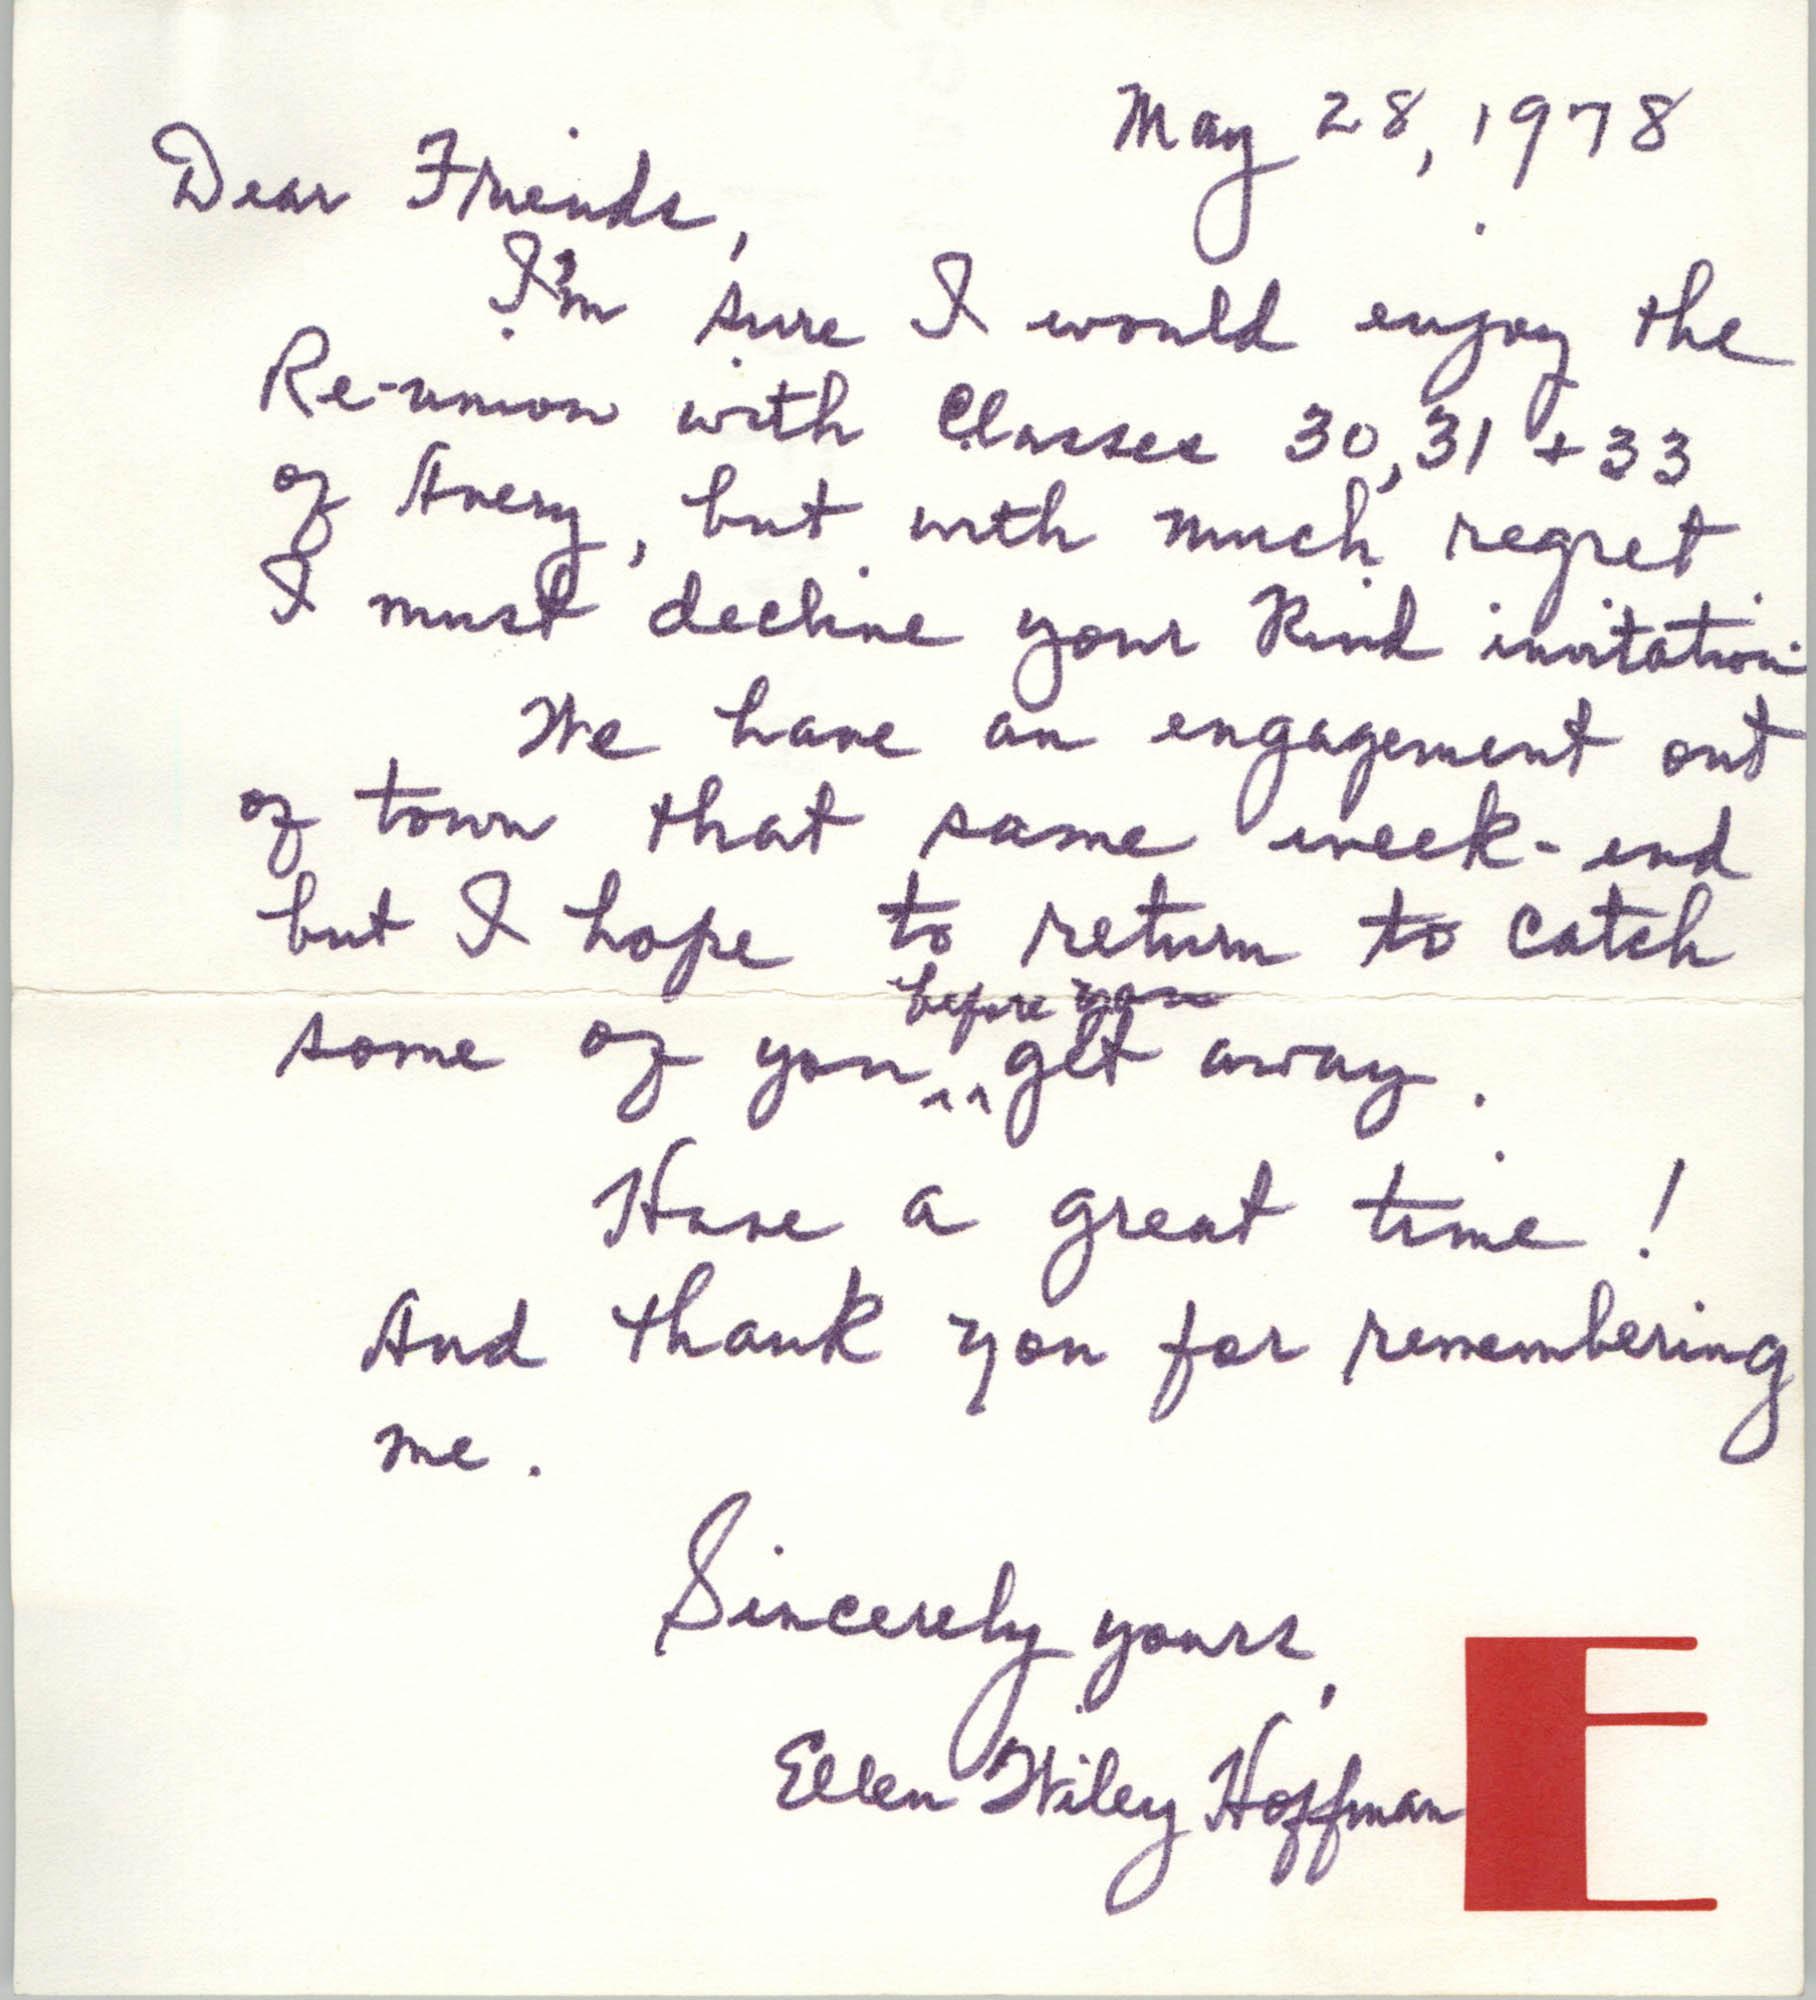 Letter from Ellen Wiley Hoffman, May 28, 1978